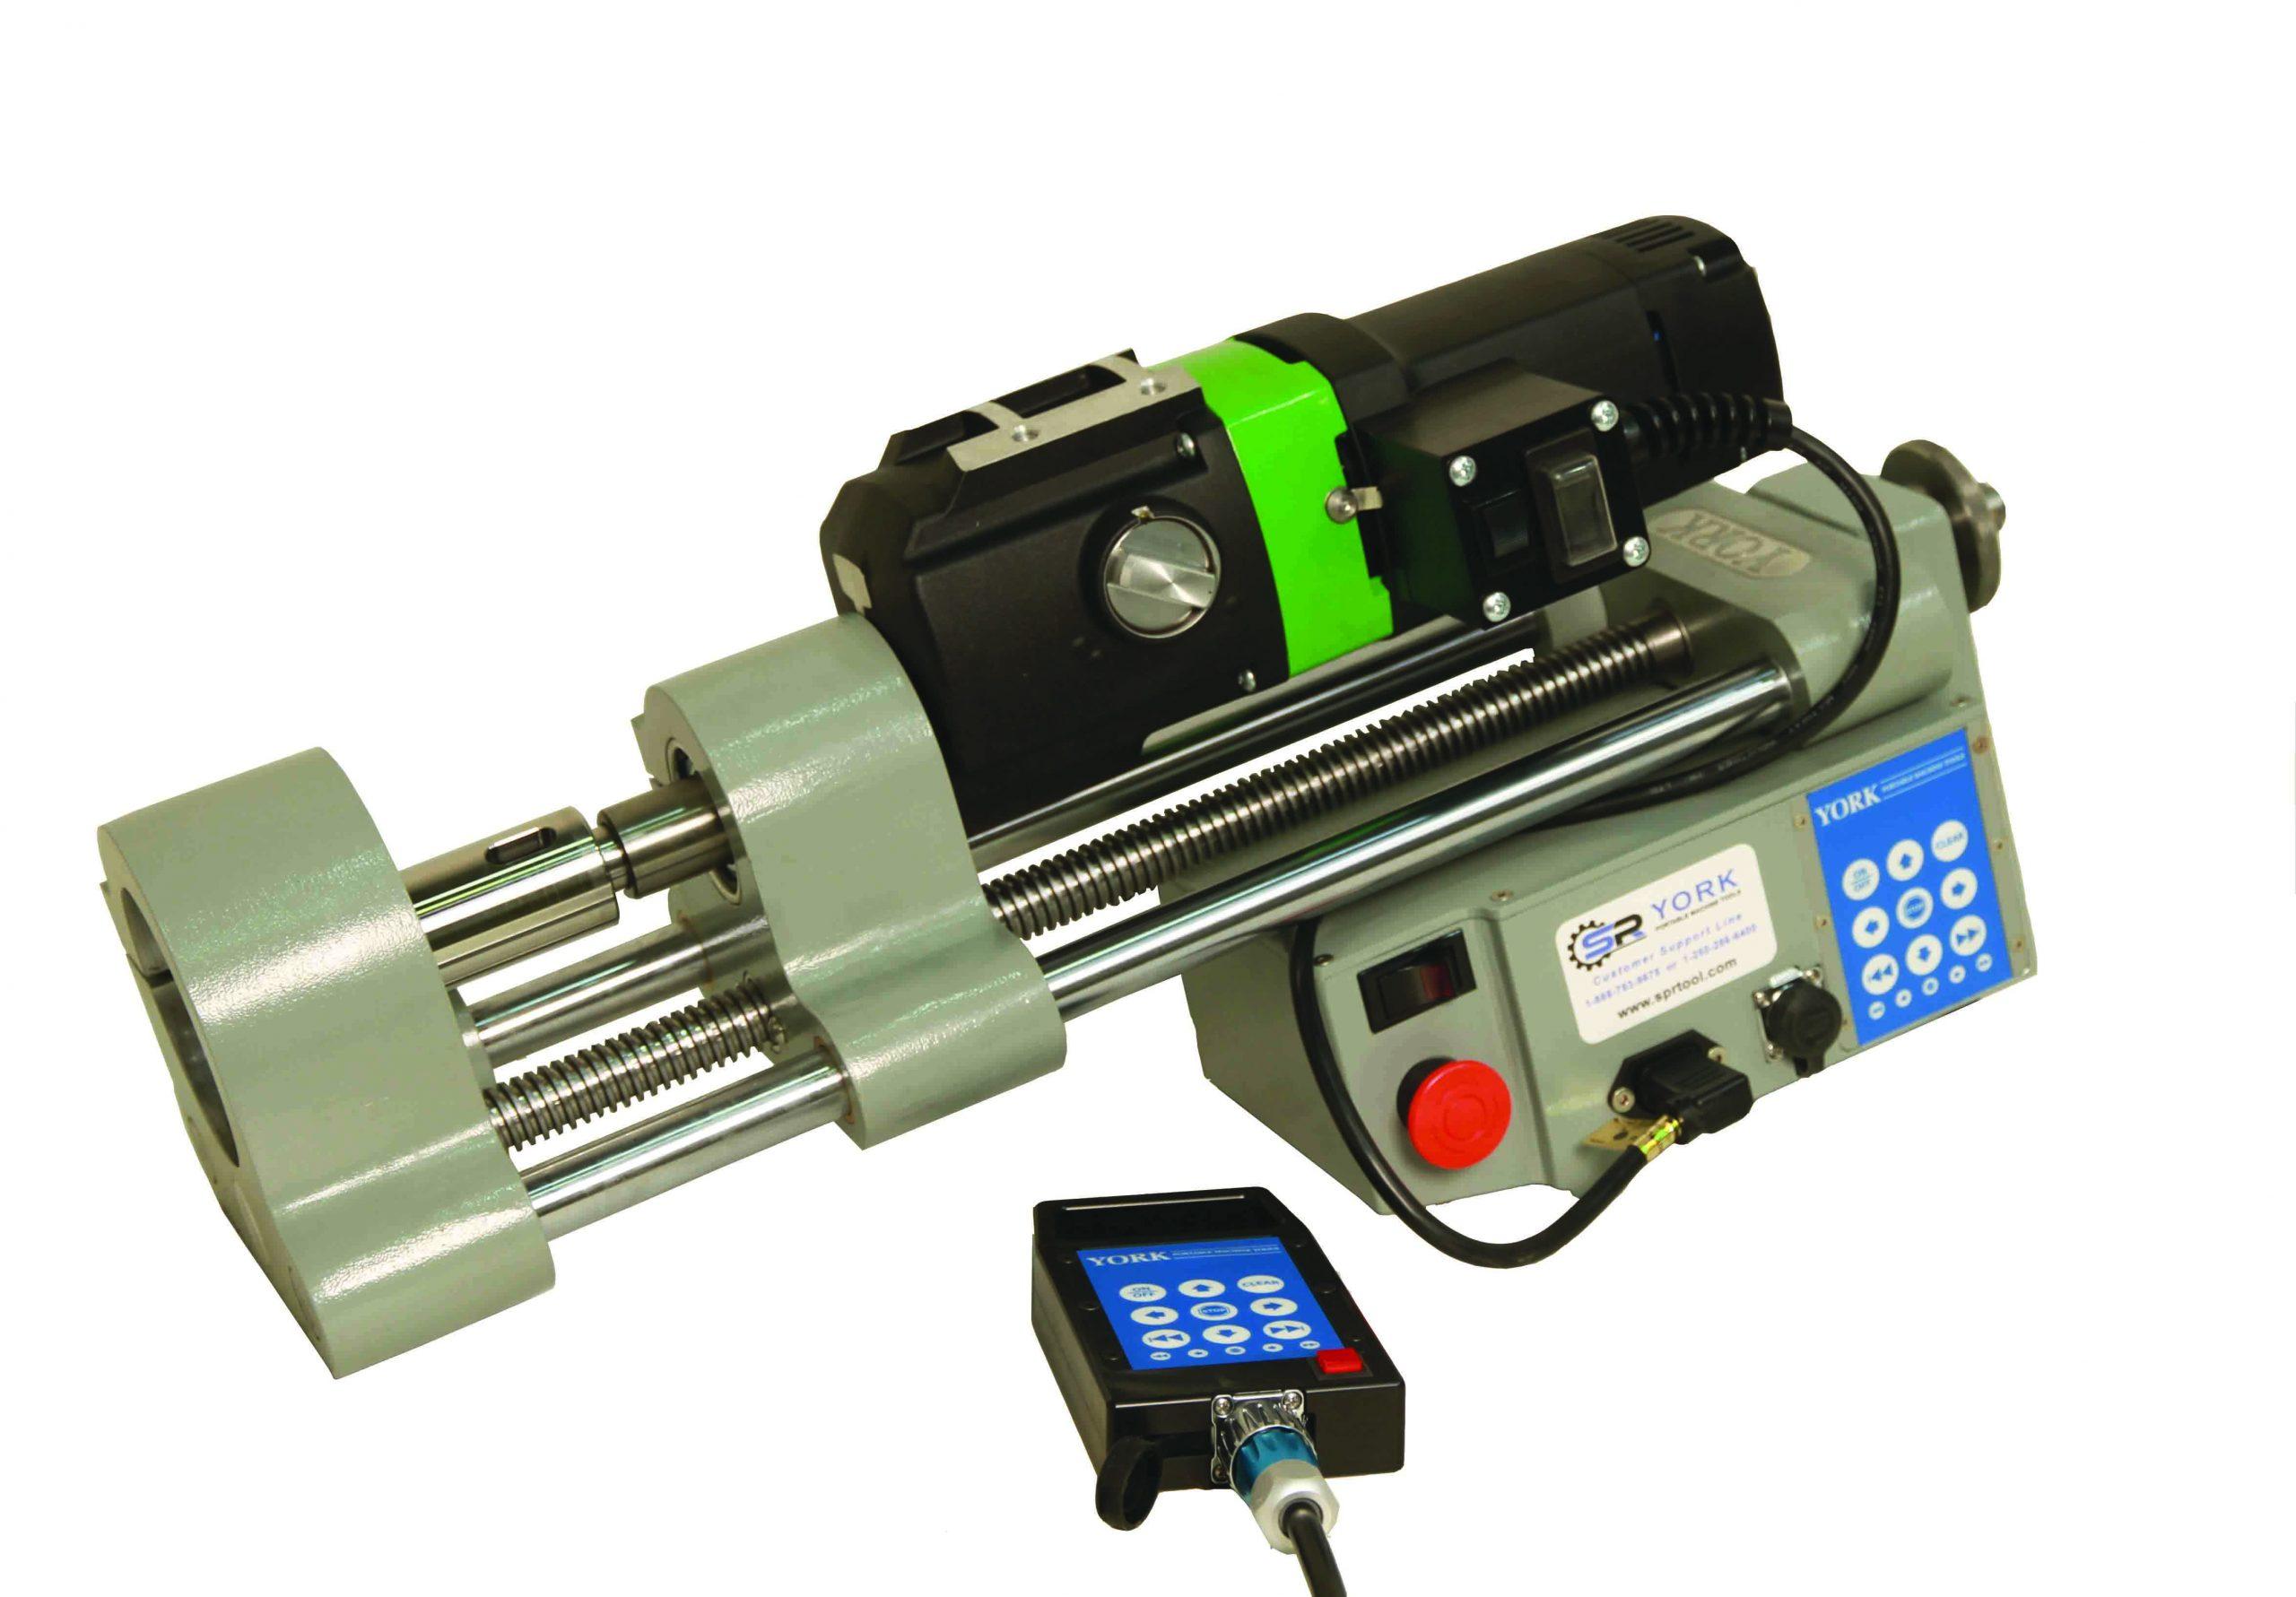 4-14 HD Line Boring Machine